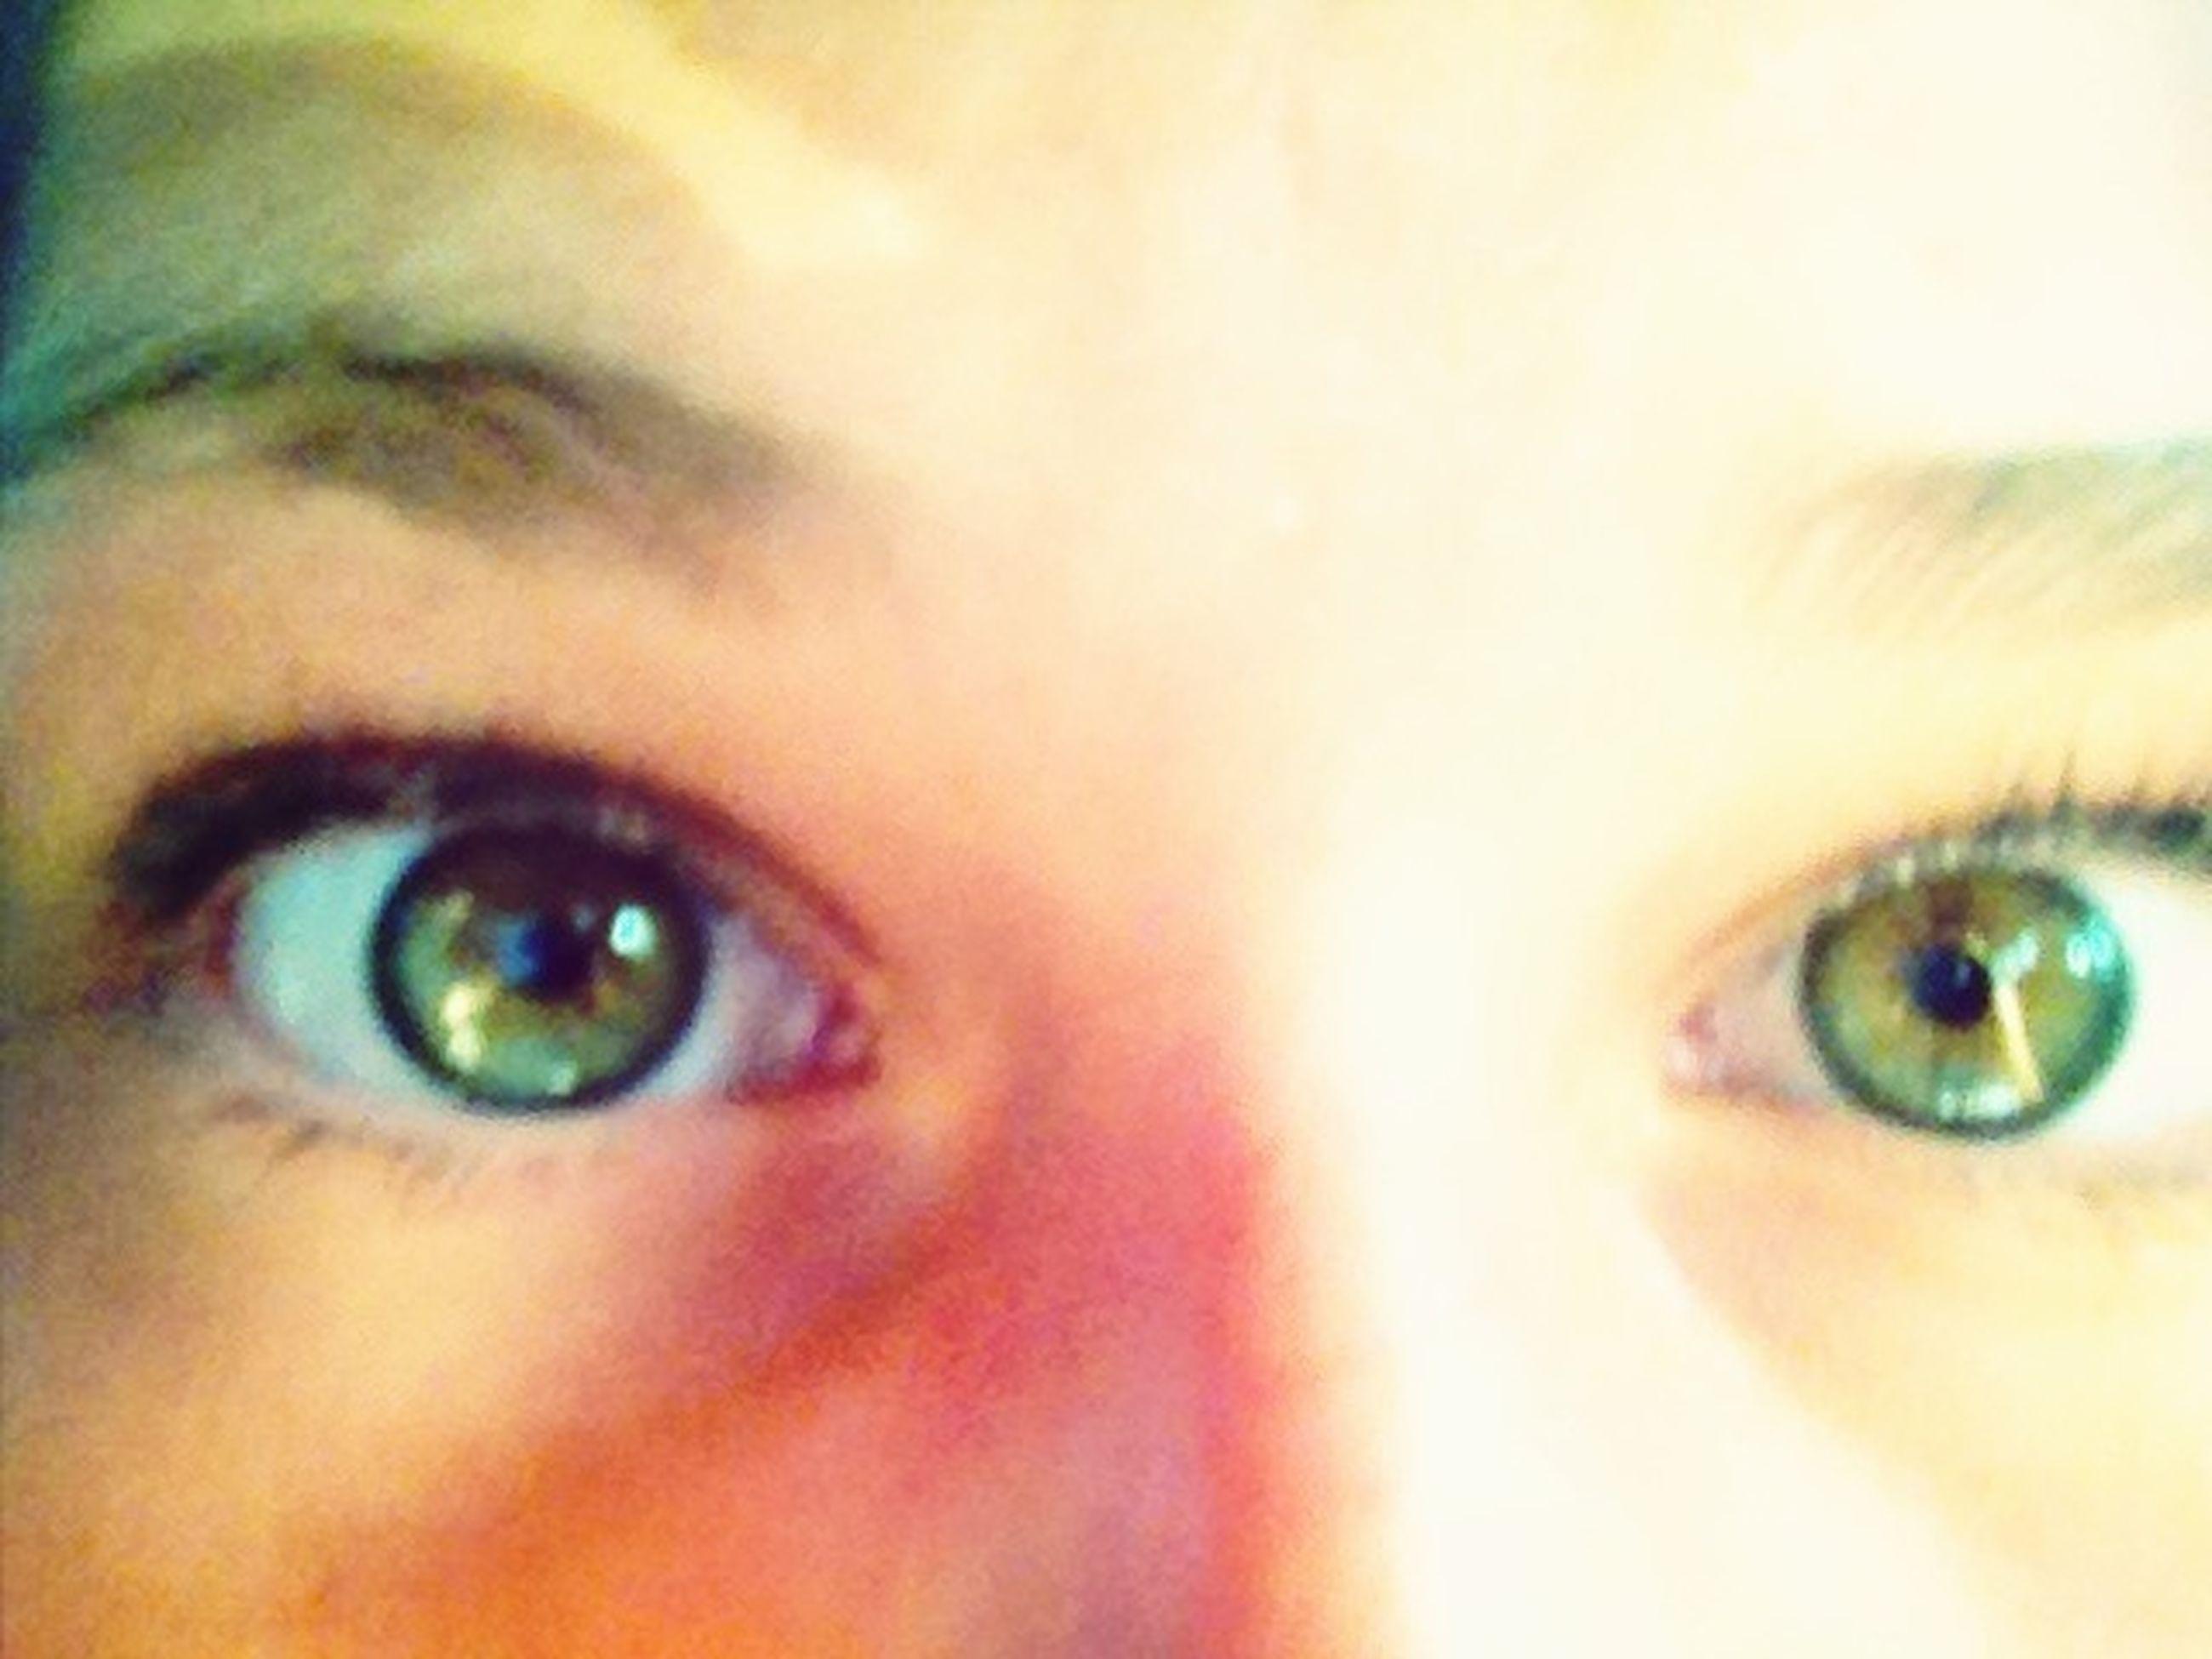 human eye, close-up, looking at camera, portrait, eyelash, headshot, human face, lifestyles, eyesight, part of, sensory perception, extreme close up, indoors, young adult, extreme close-up, person, leisure activity